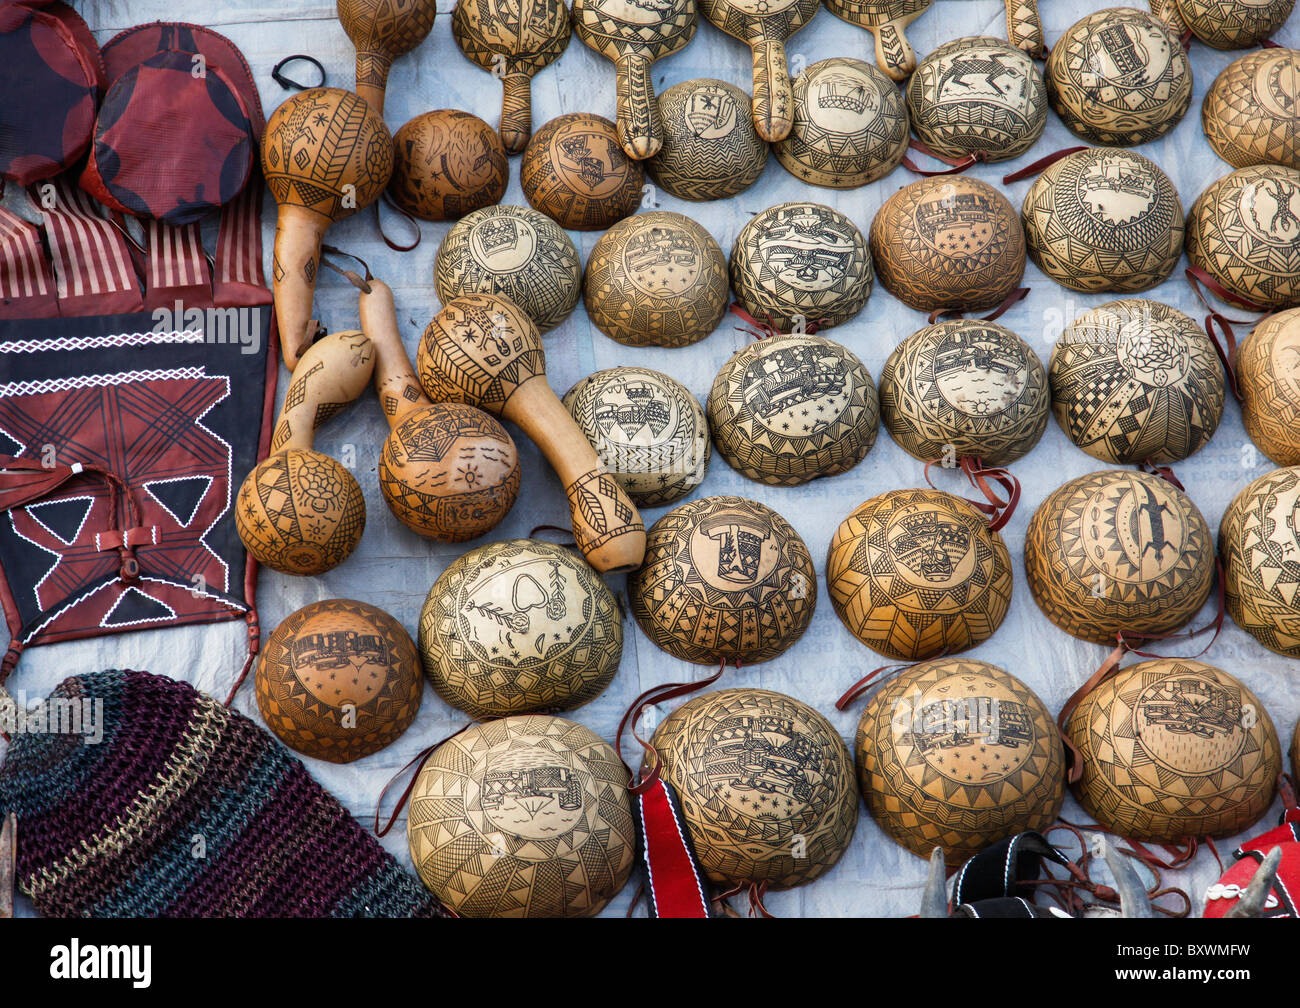 Bei den halbjährlichen Salon International de l'Artisanat de Ouagadougou in Burkina Faso Anbieter verkaufen SIAO Kalebassen und Kürbisse geschnitzt Stockfoto